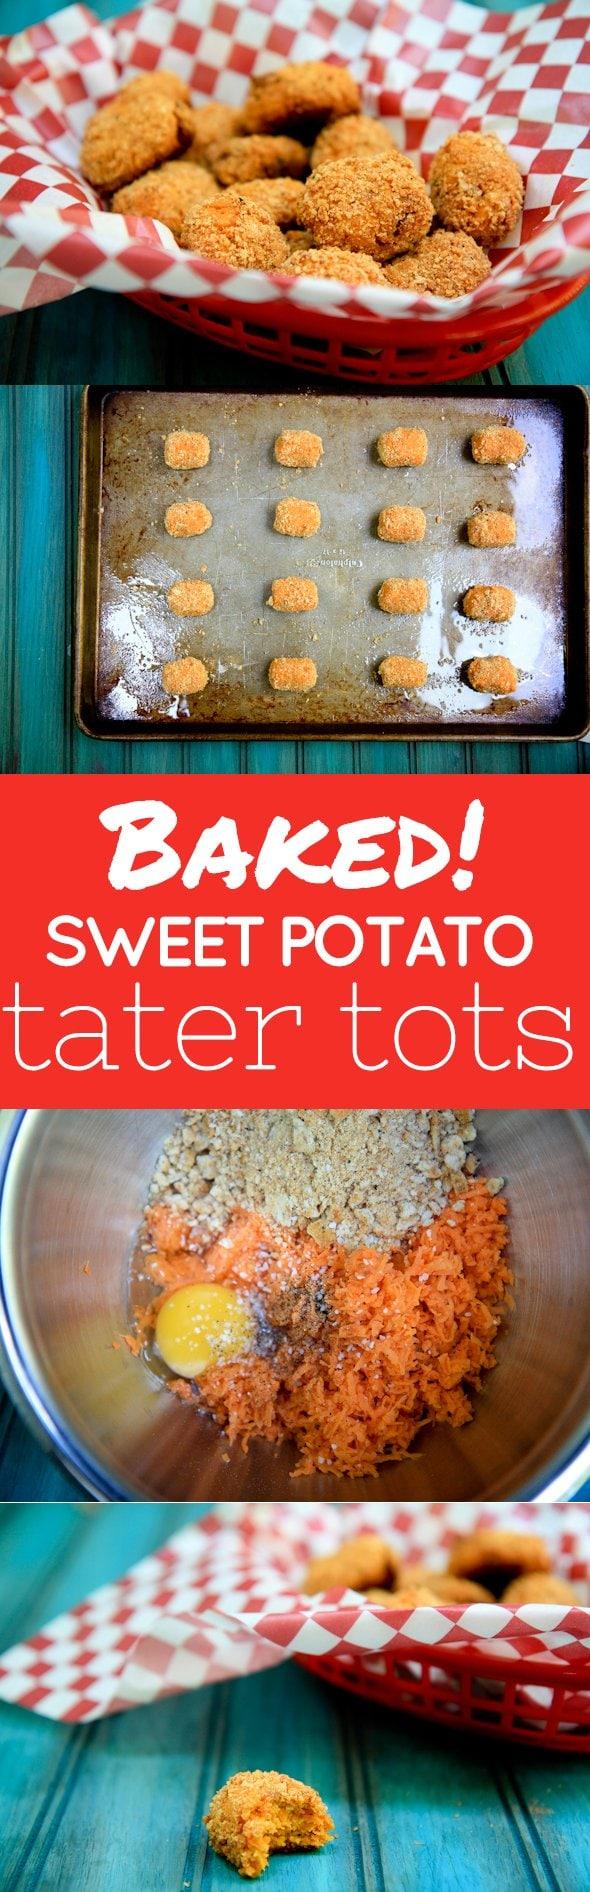 Baked Sweet Potato Tater Tots